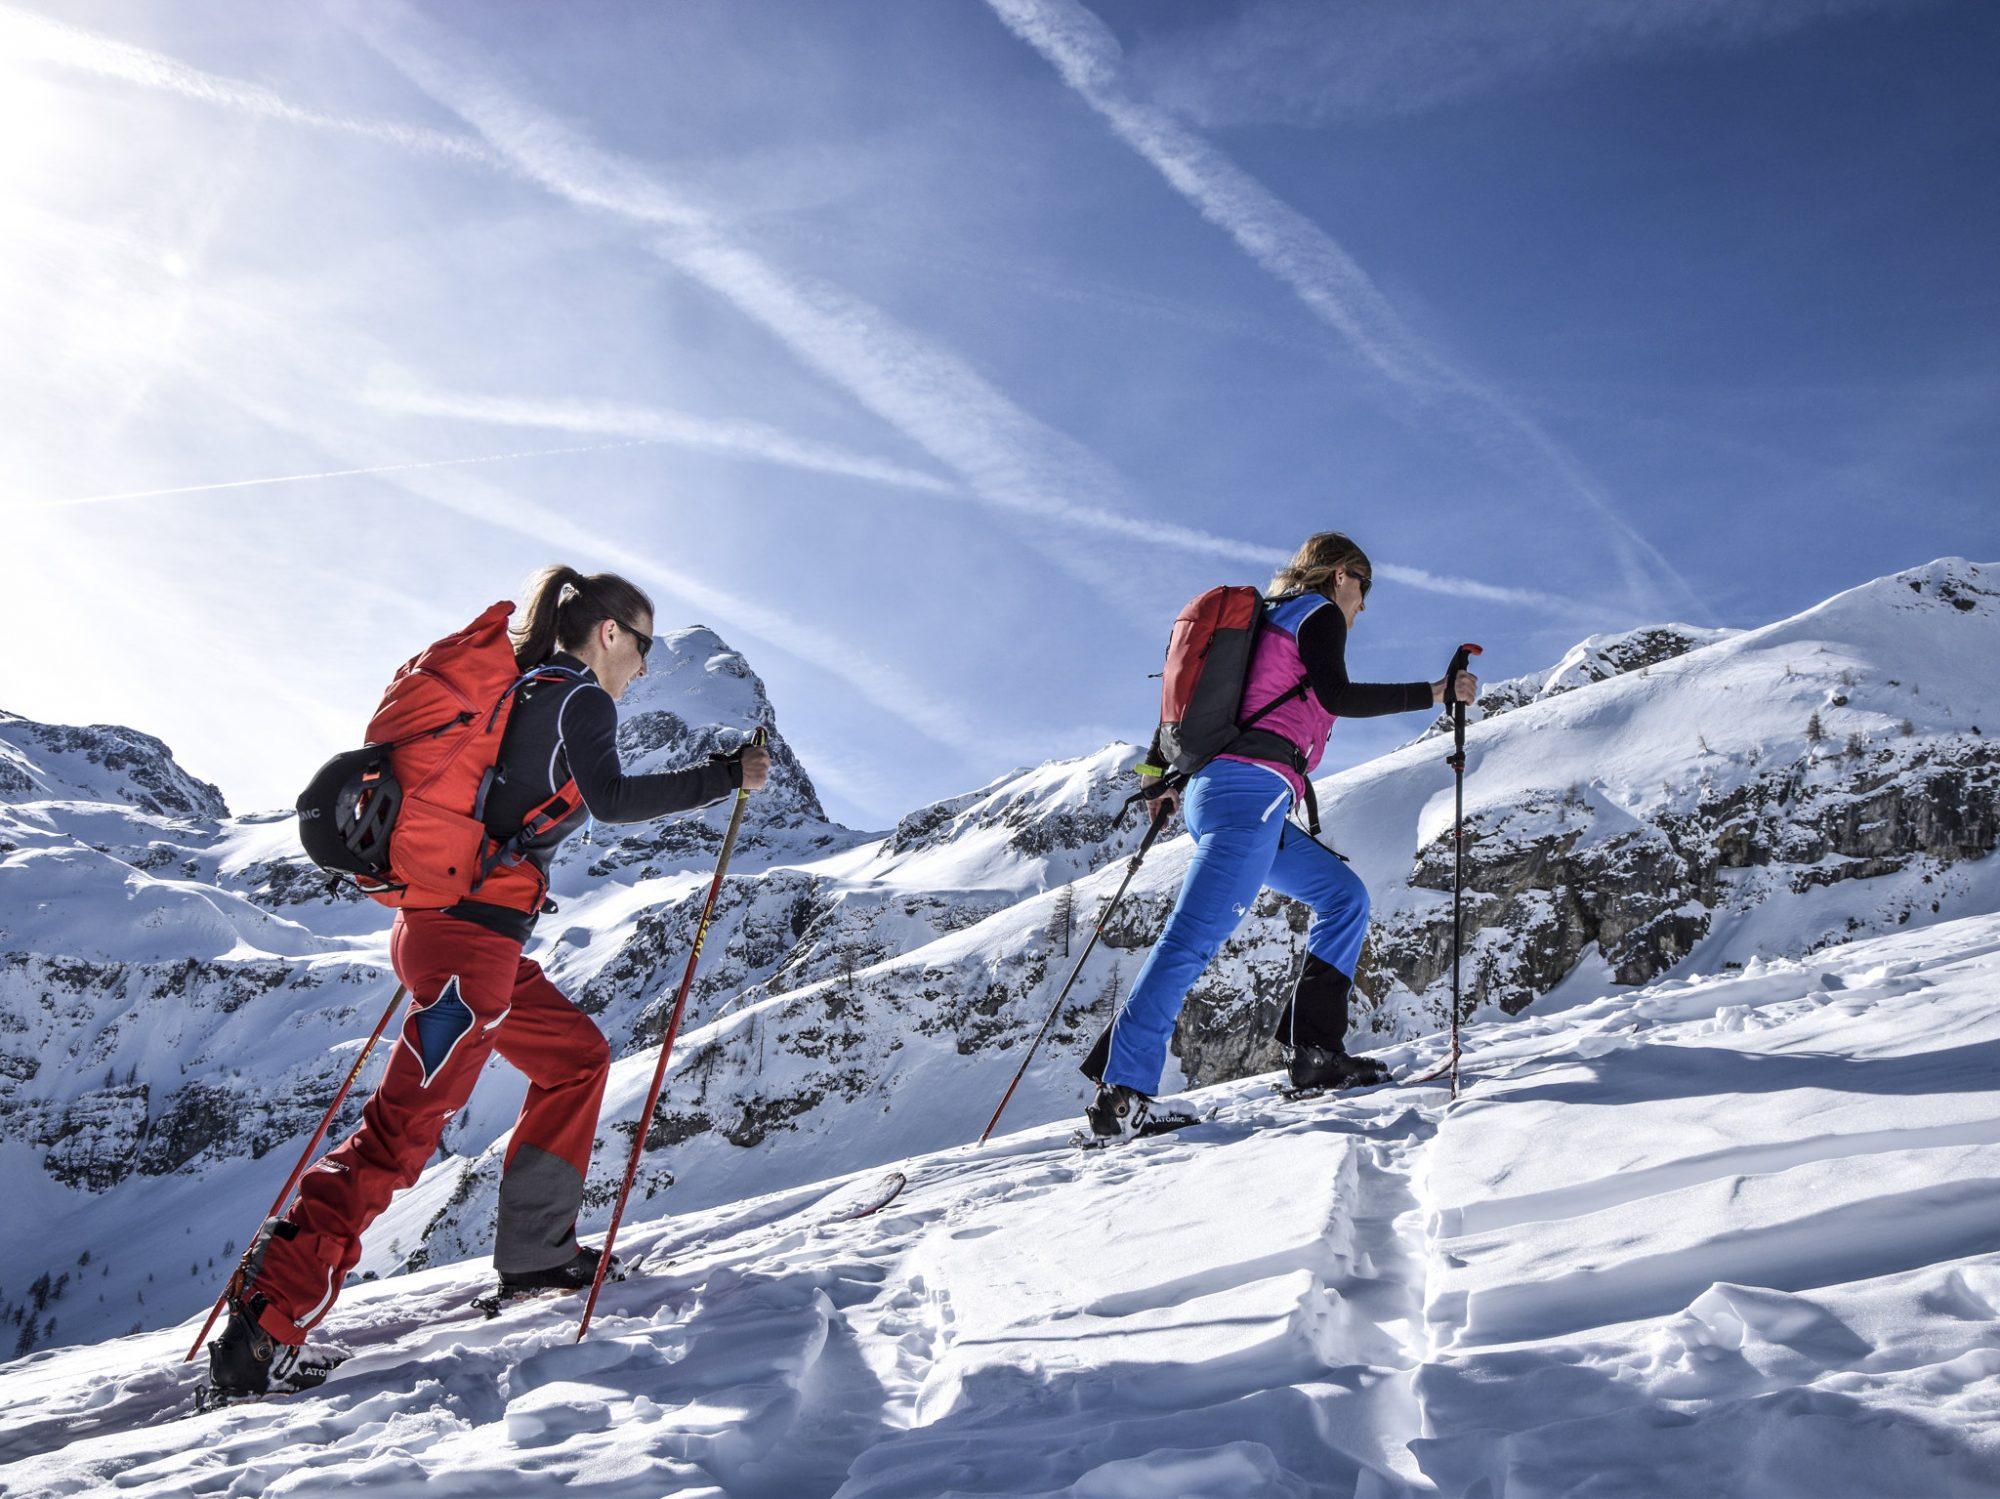 Abenteurerinnen, Berghasen, Outdoorfrauenpower